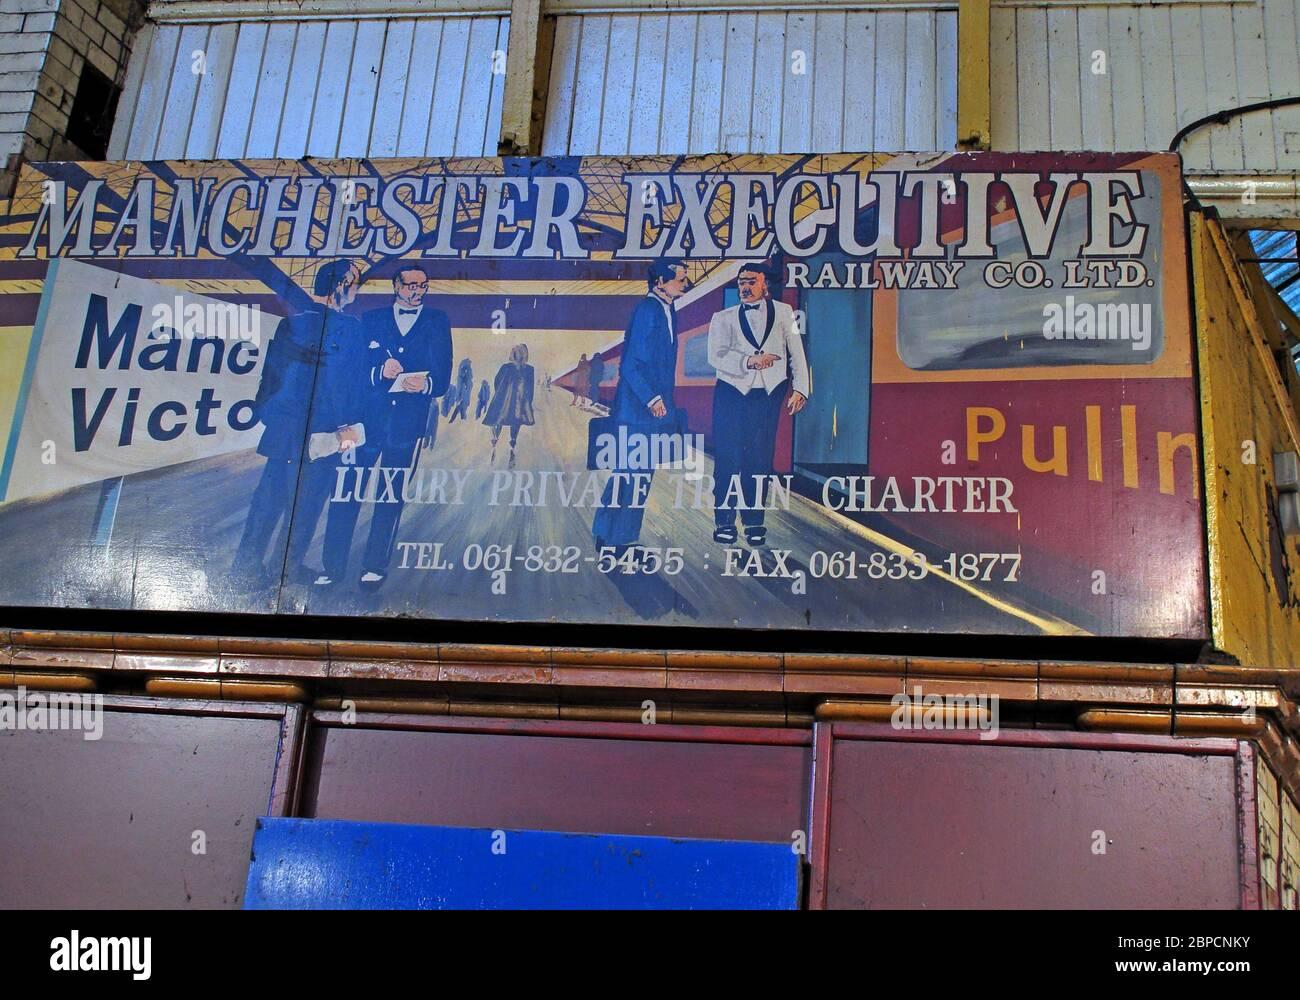 Dieses Stockfoto: Manchester Victoria, Manchester Executive, Pullman, Tours, Railway Co, Luxus-Zugcharter, Poster, Greater Manchester, England, Großbritannien - 2BPCNK